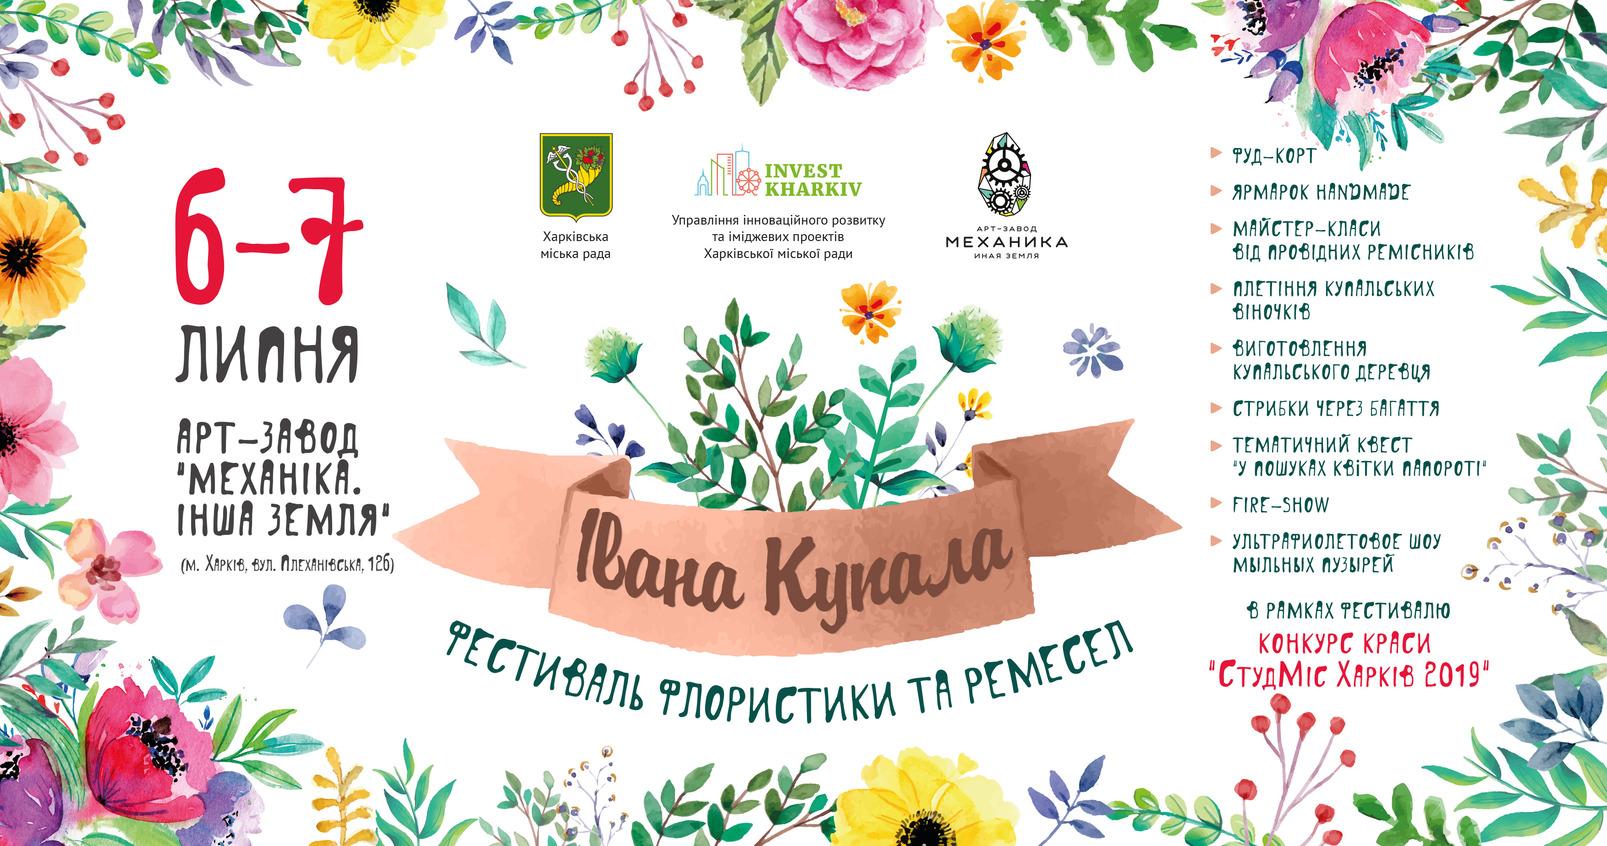 Ивана Купала в Харькове